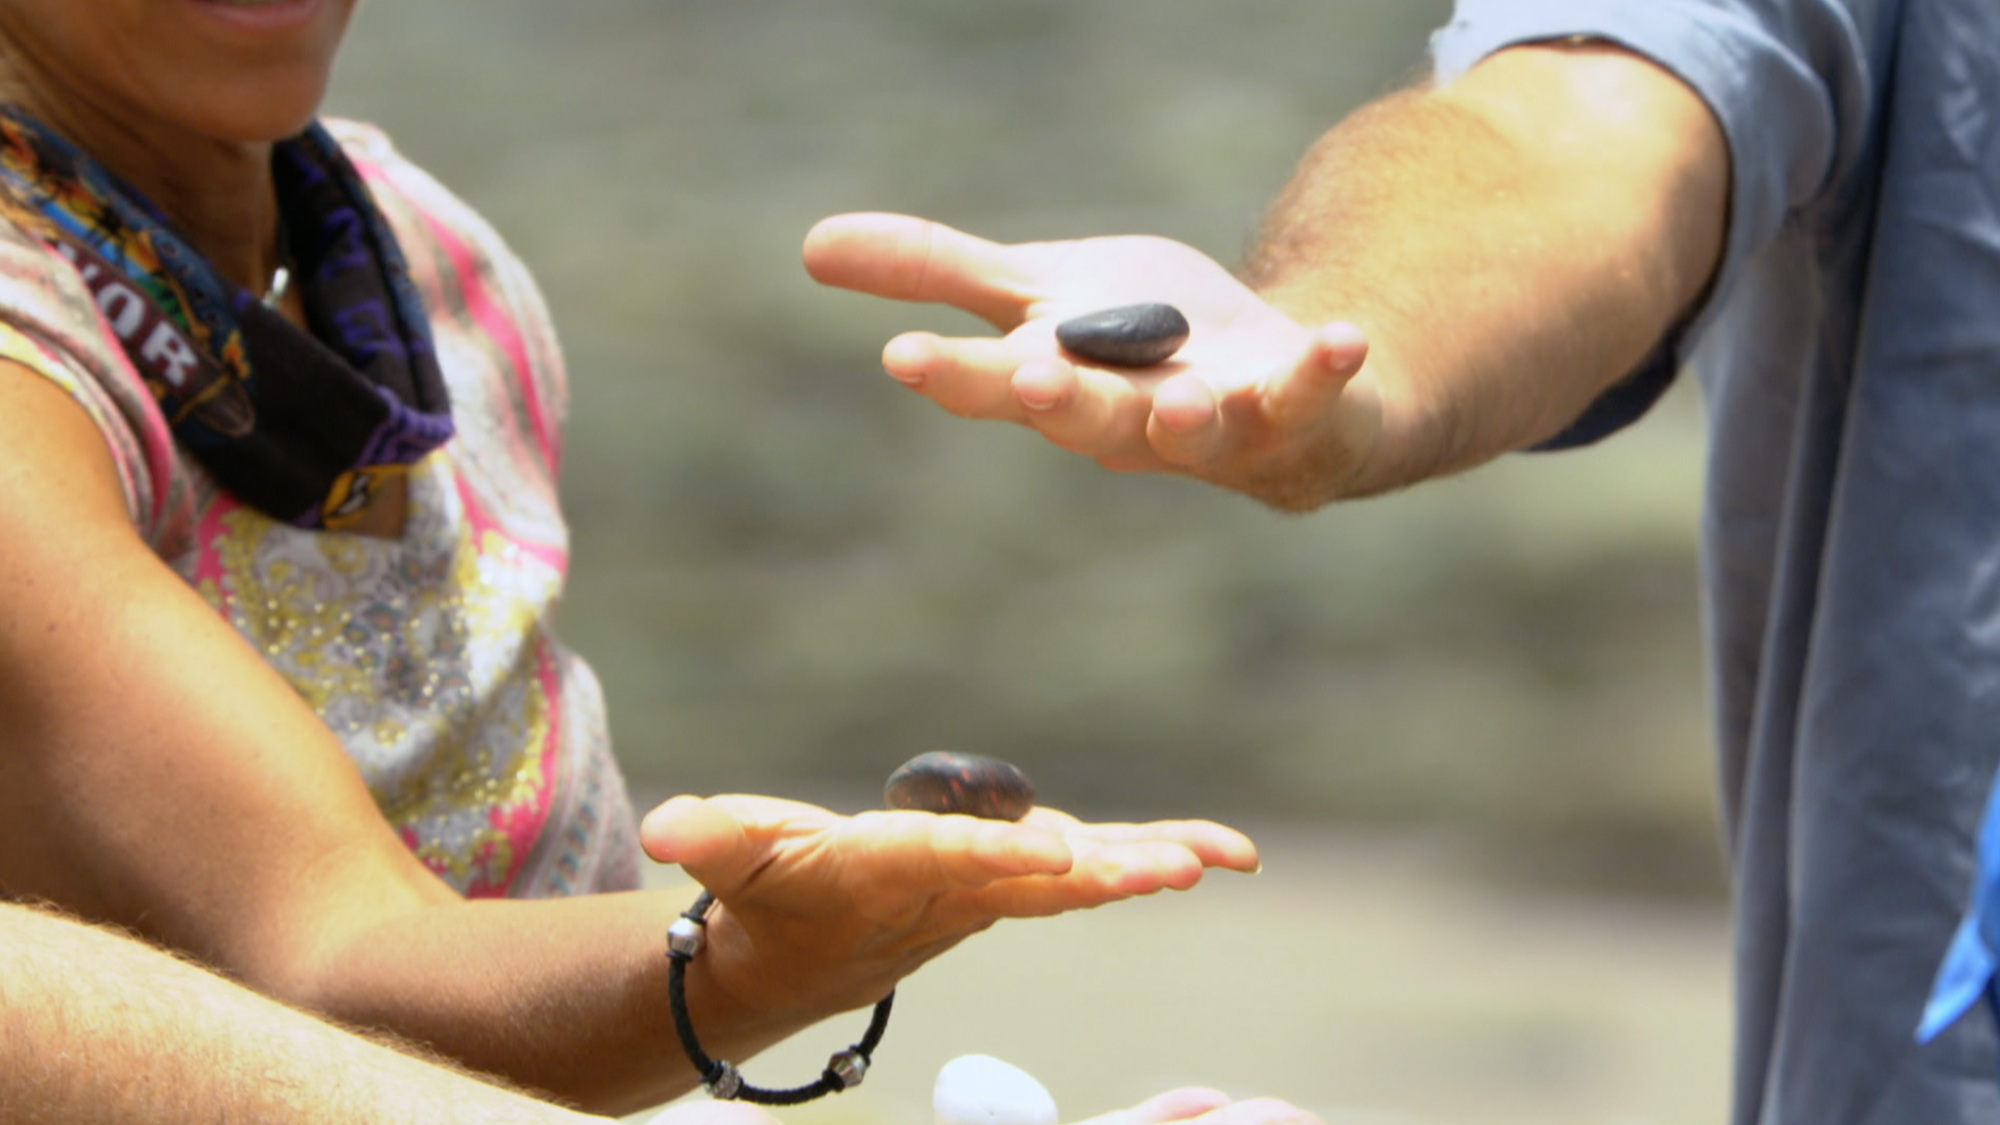 Dan picks the winning rock